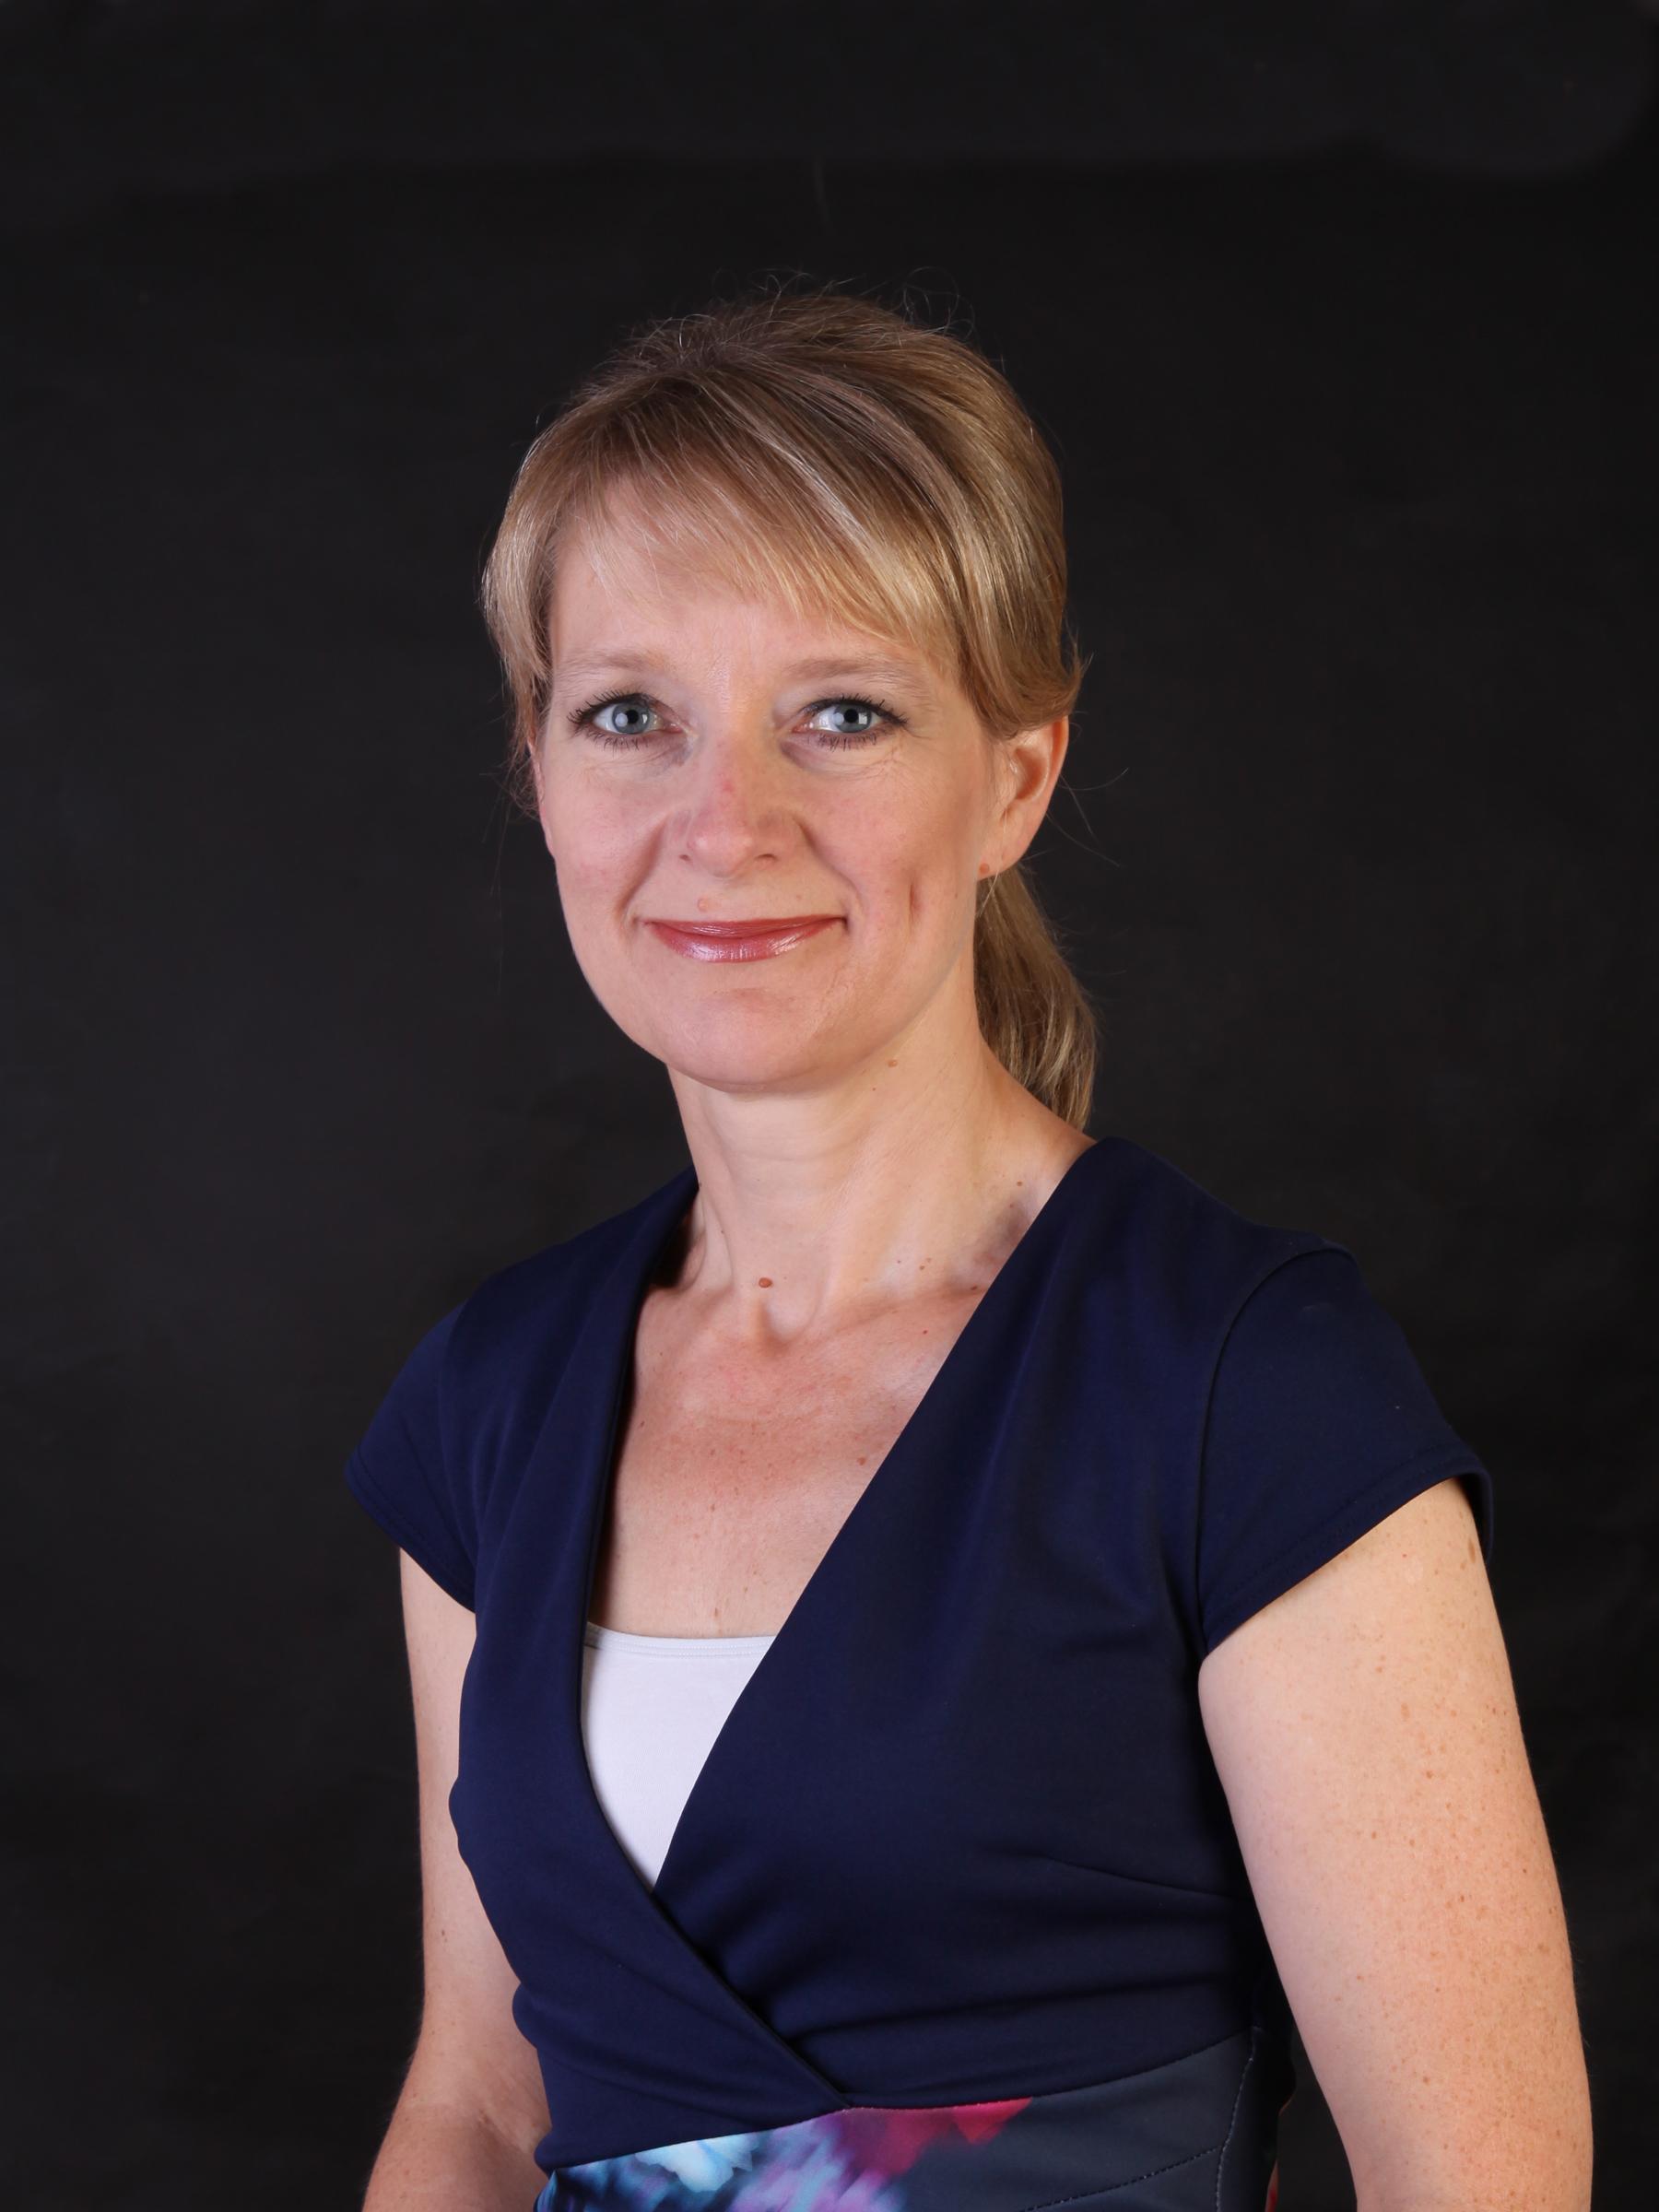 aMANDA MACAULEY - FOUNDER & DIRECTOR